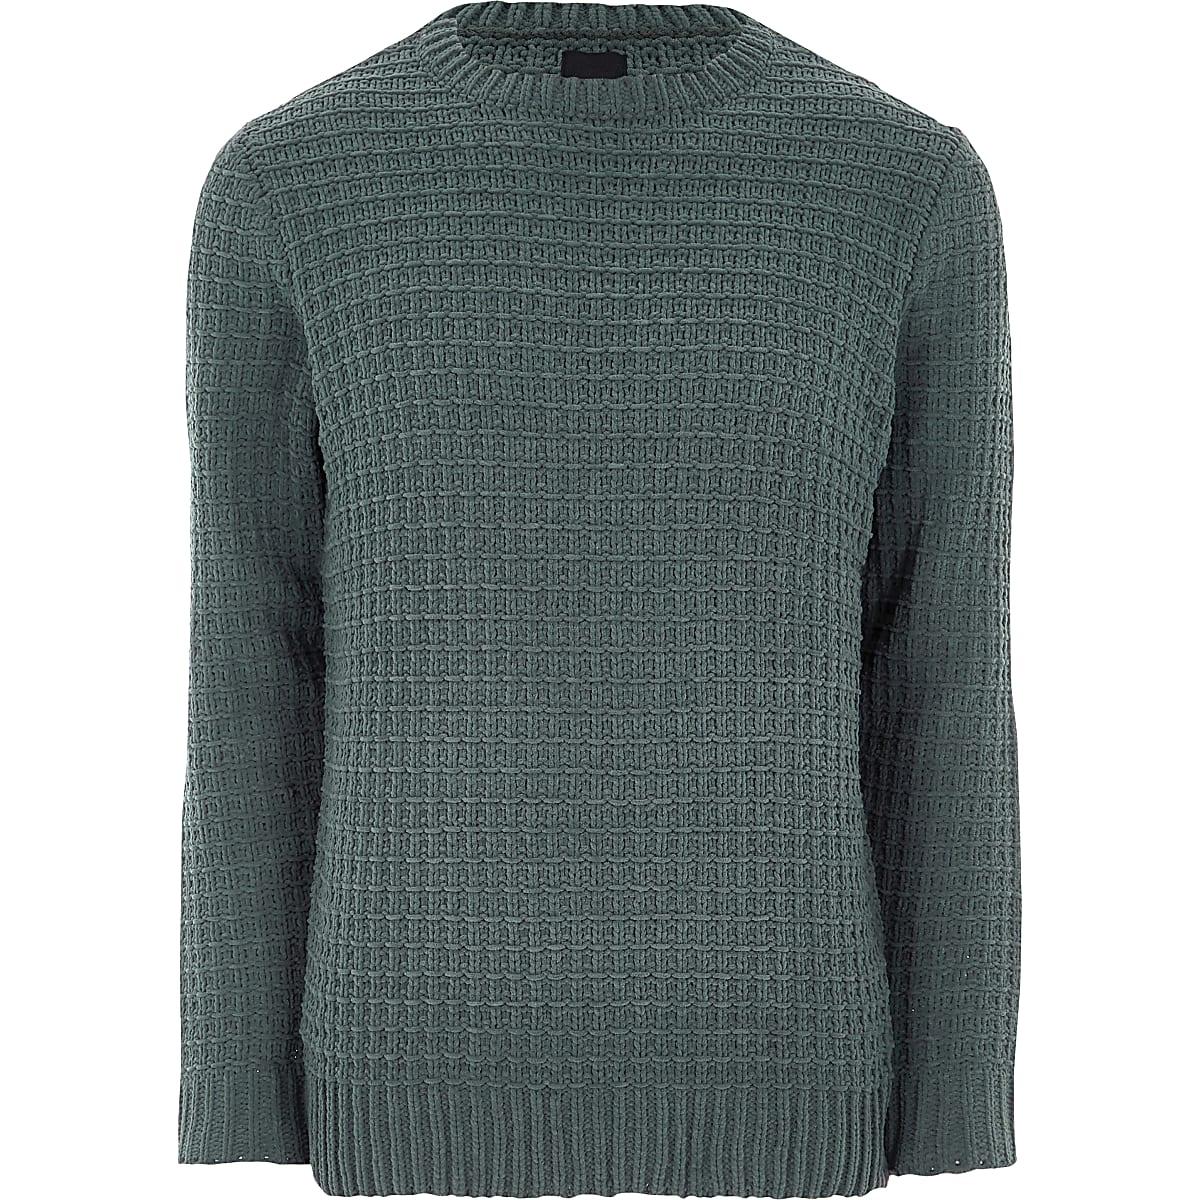 Dark green textured chenille knit jumper